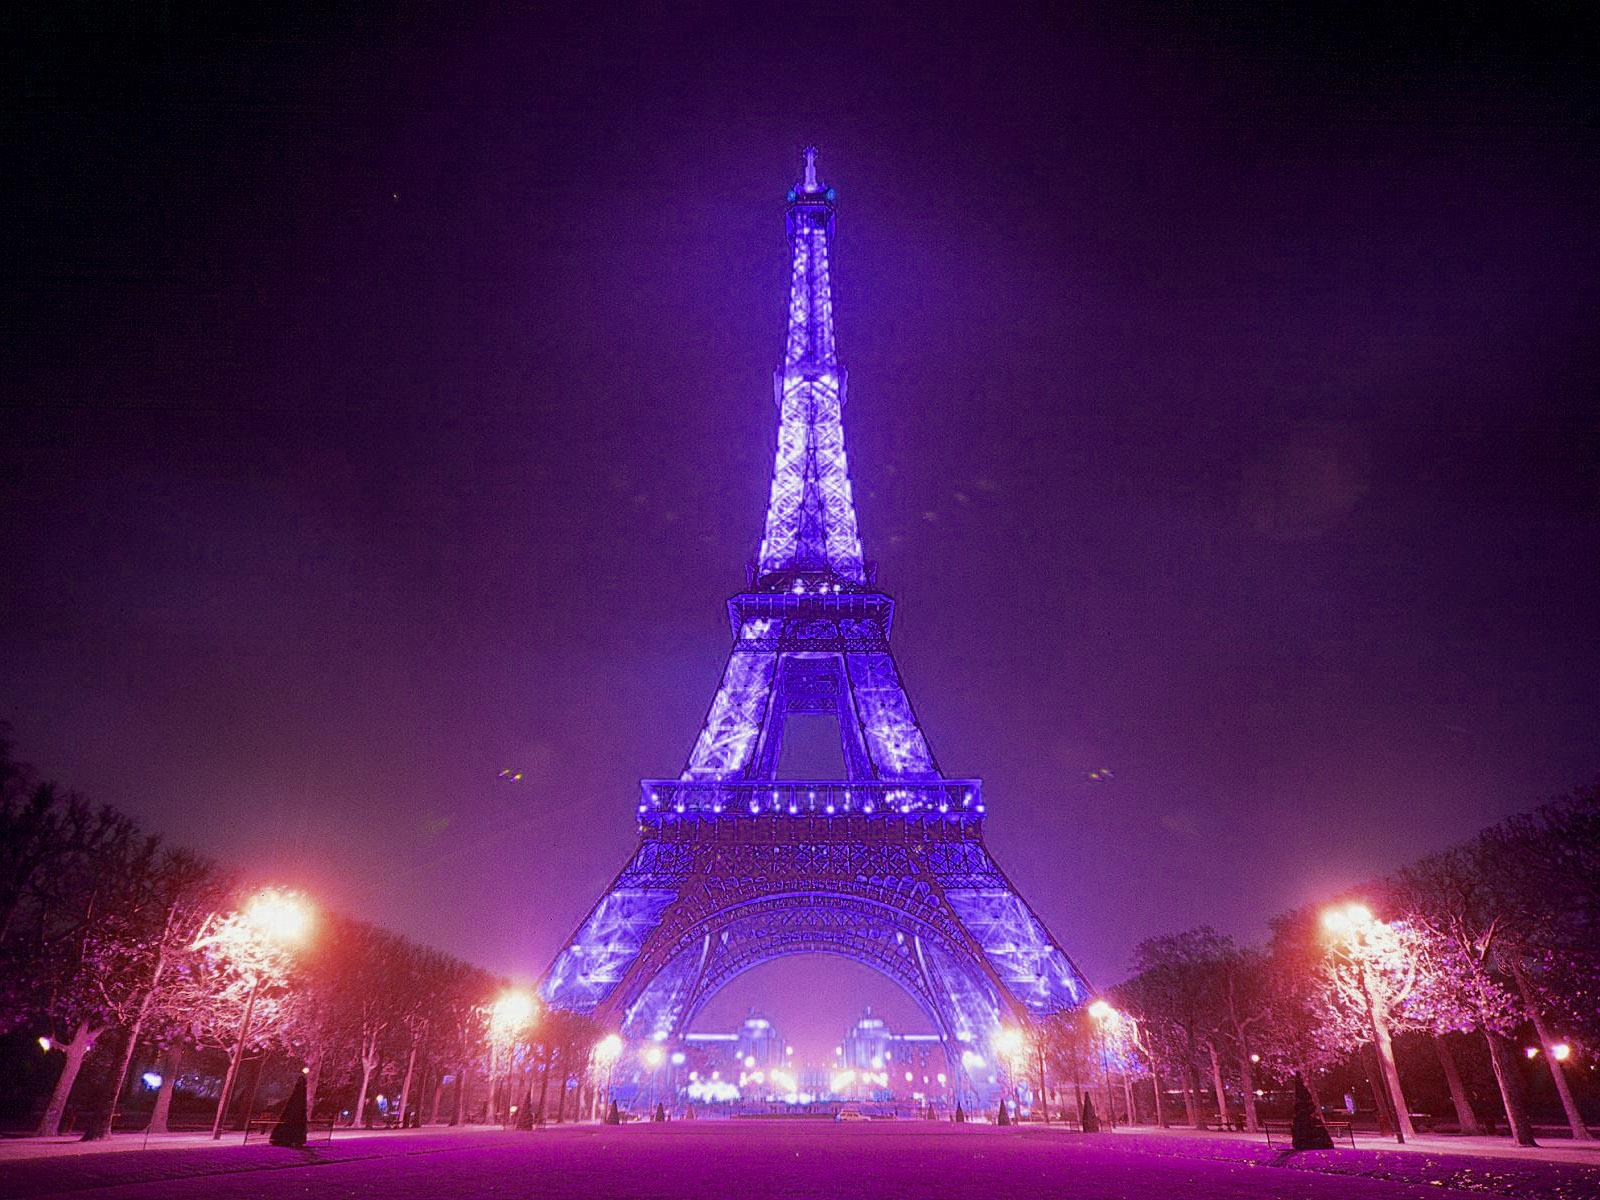 Girly Eiffel Tower Wallpaper